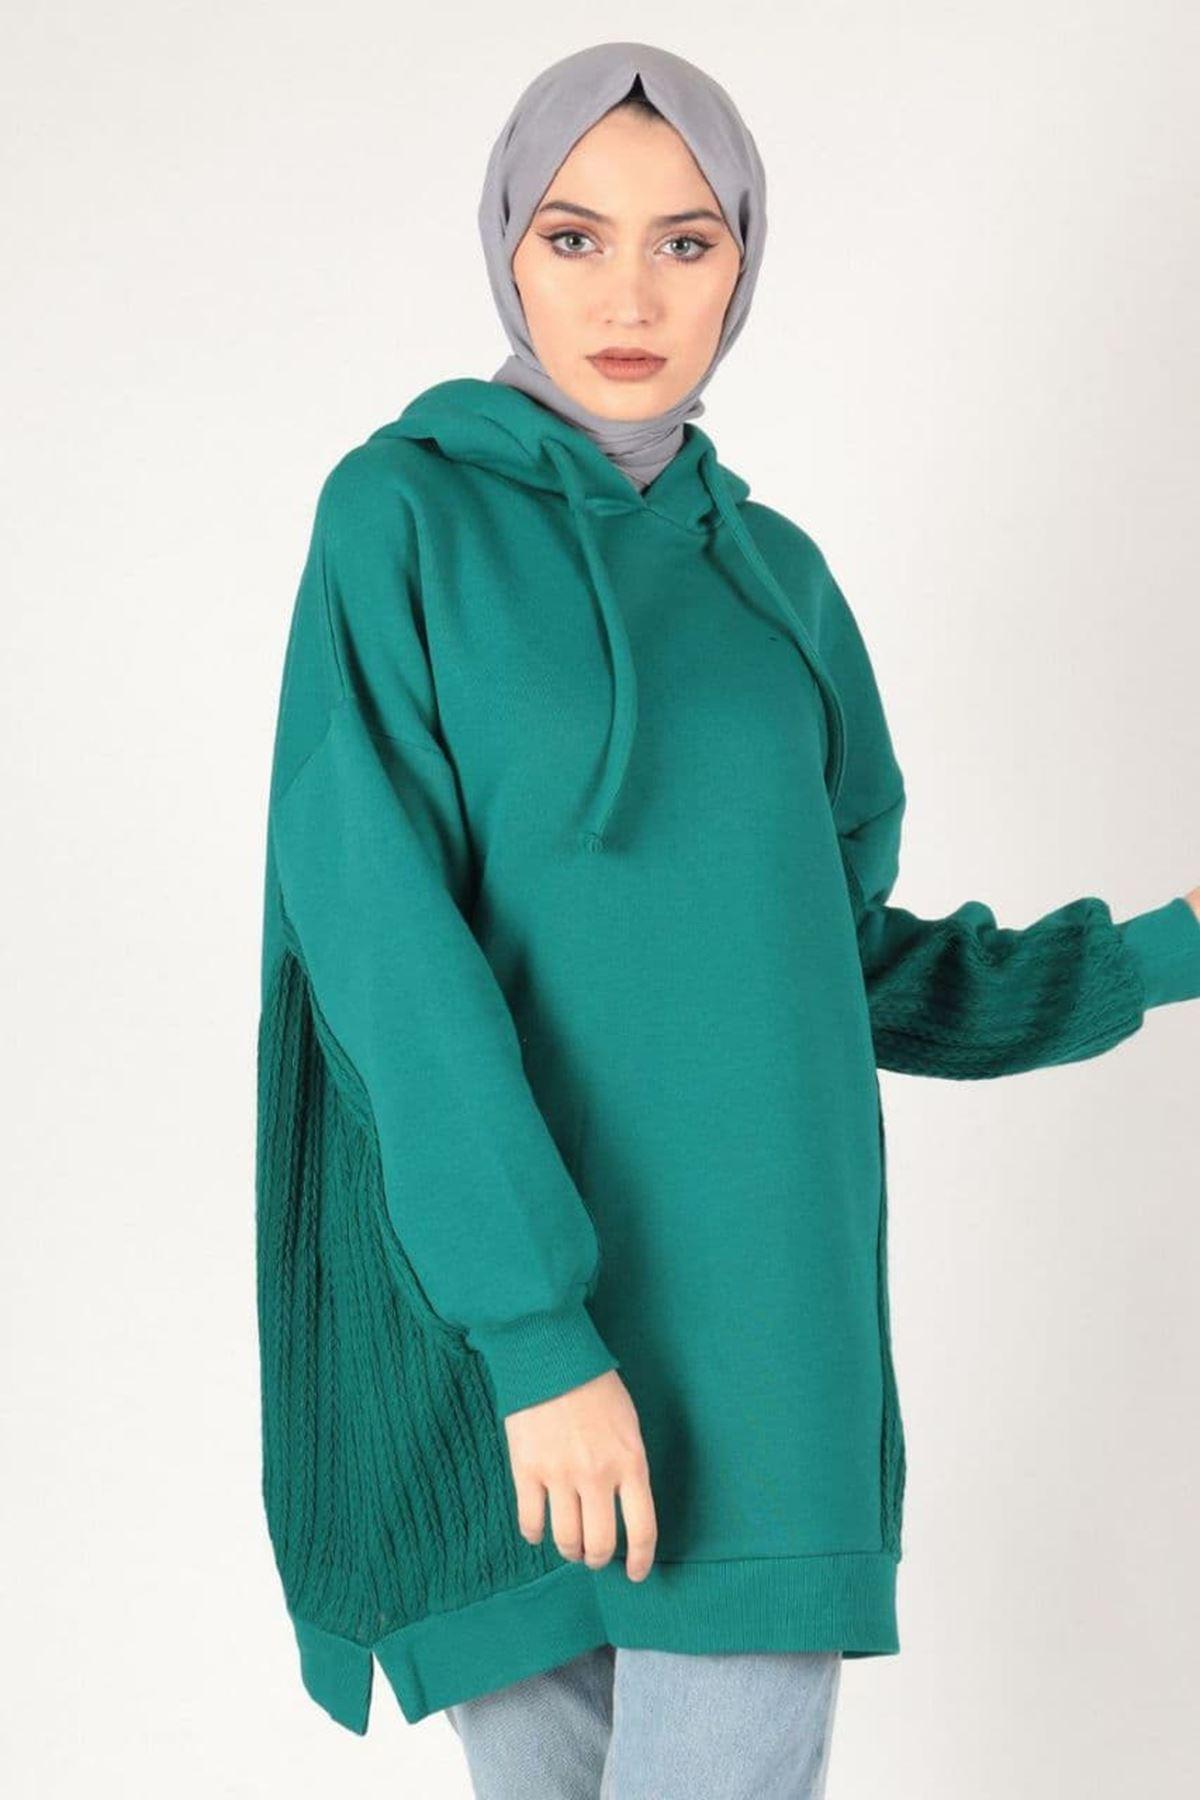 Kadın Triko Detaylı Kapişonlu Tunik - Petrol Yeşili